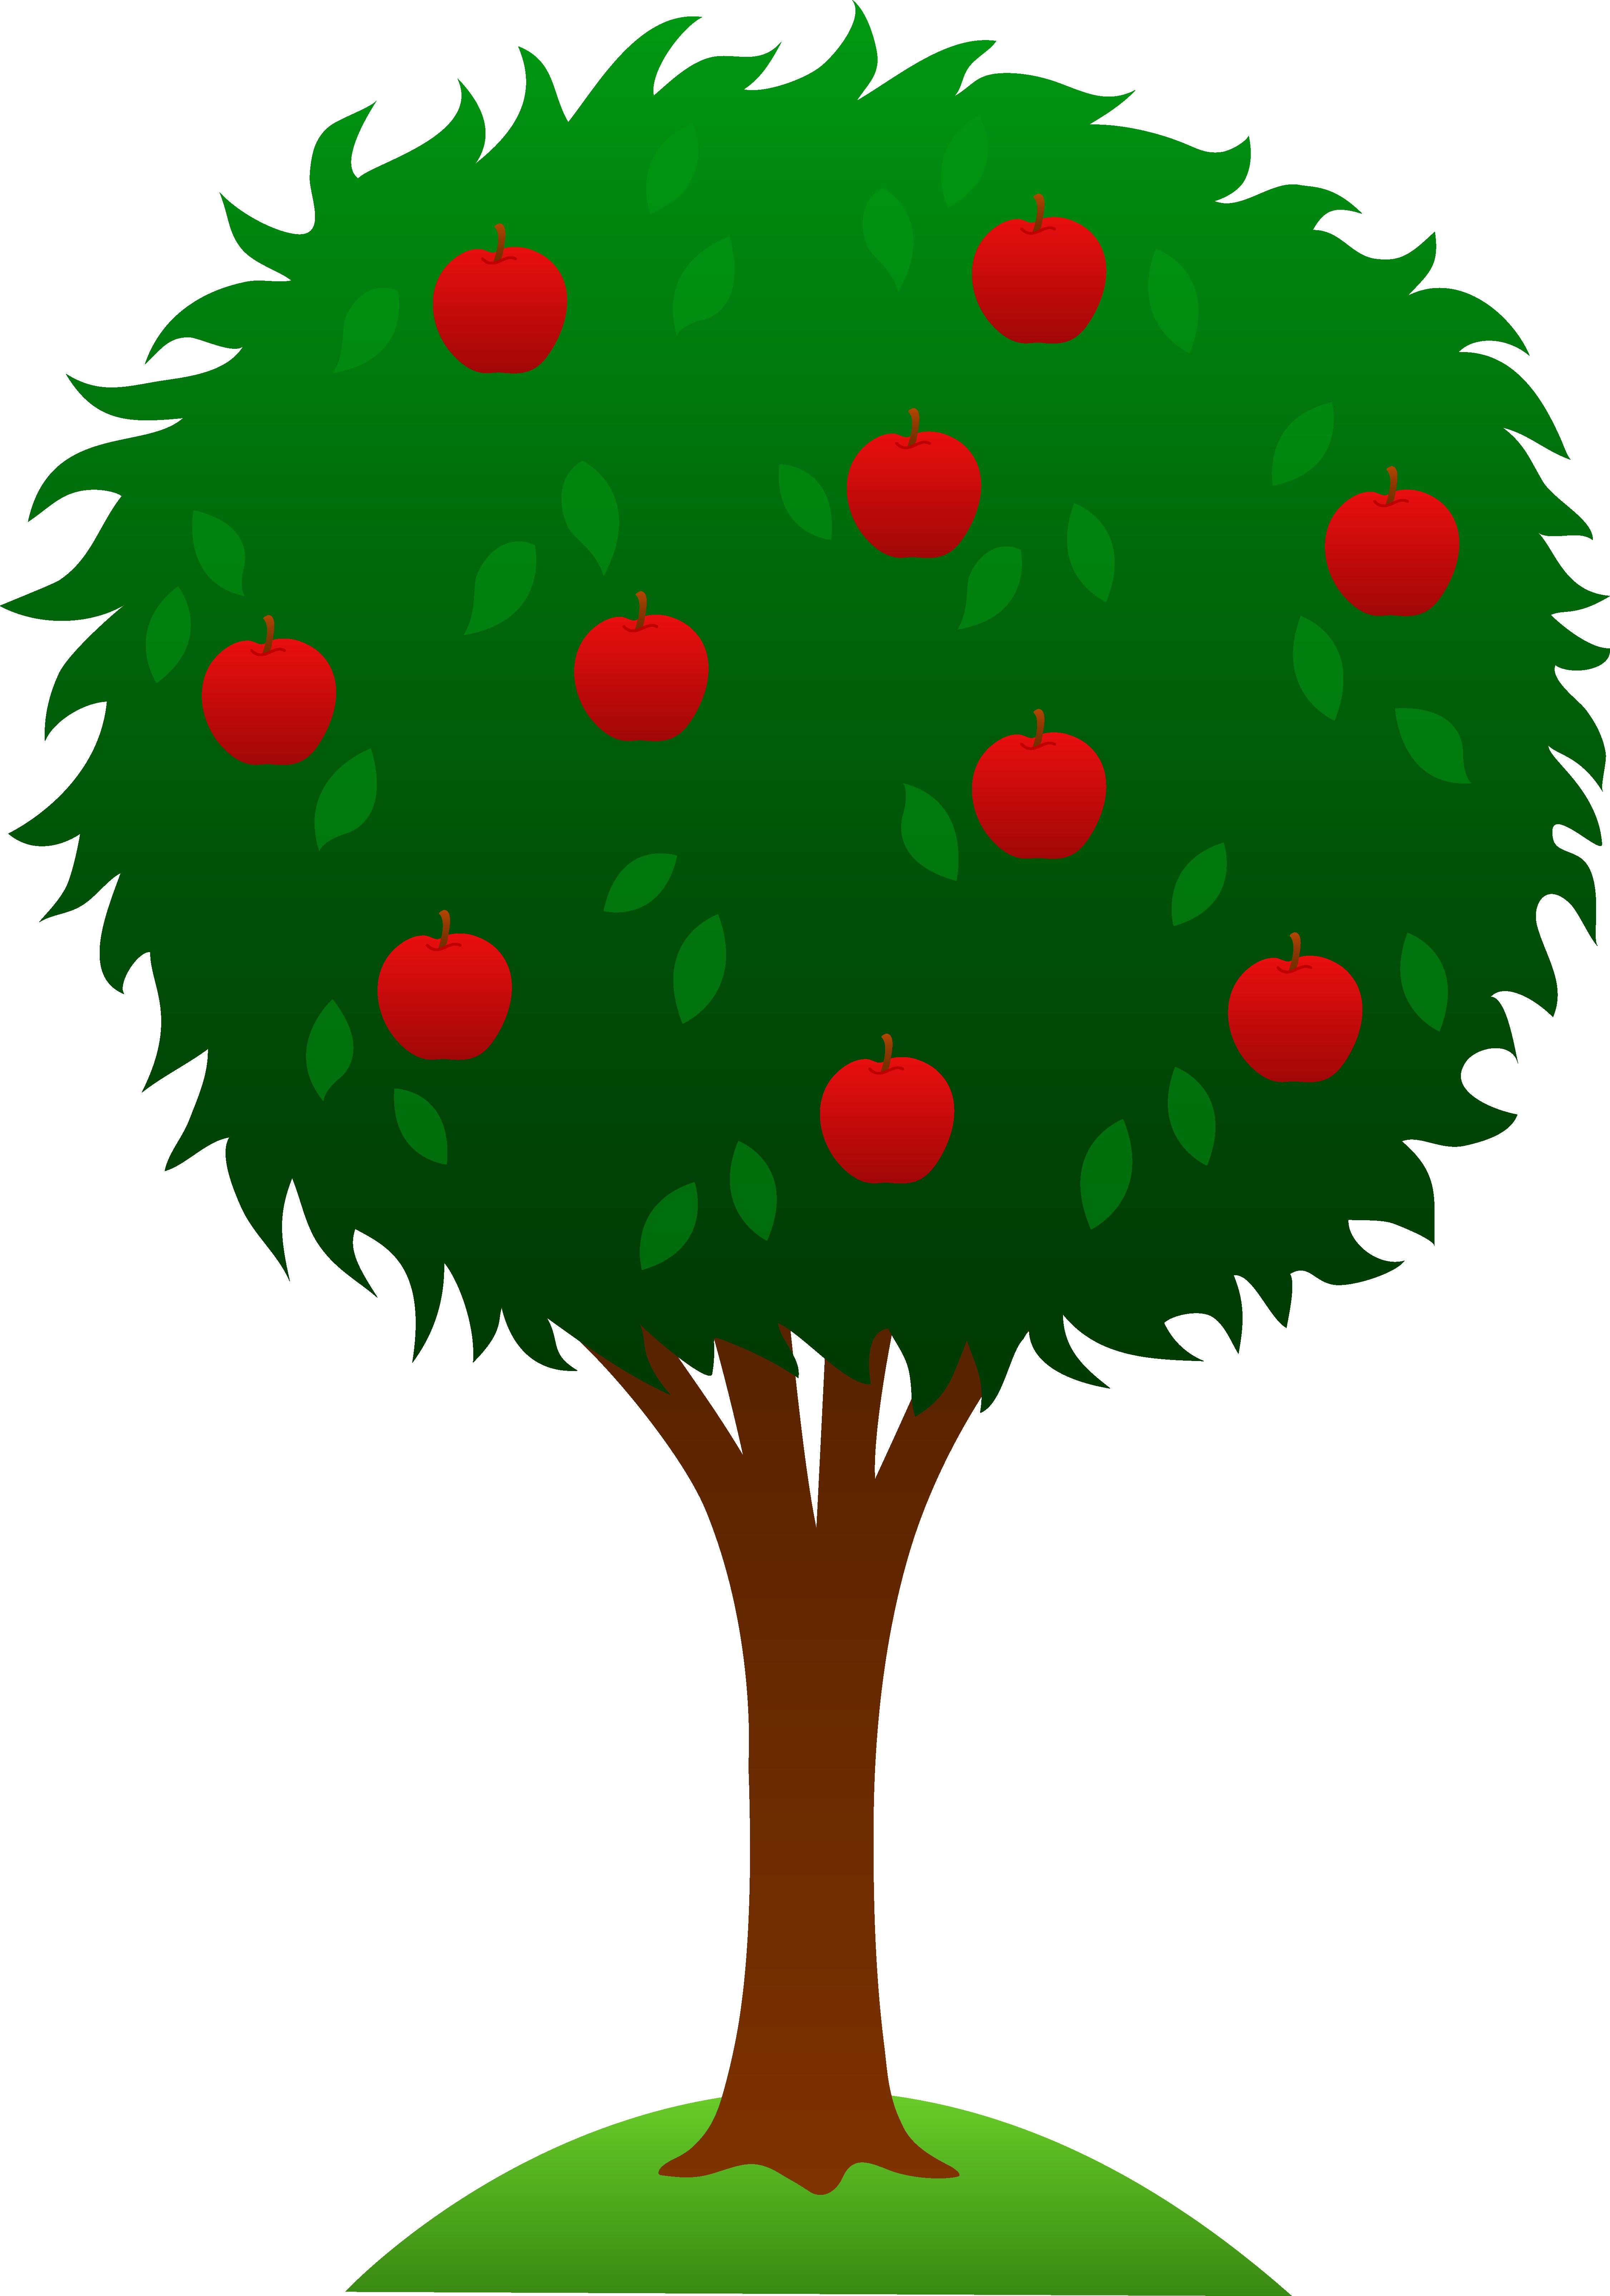 orange tree clipart-orange tree clipart-5